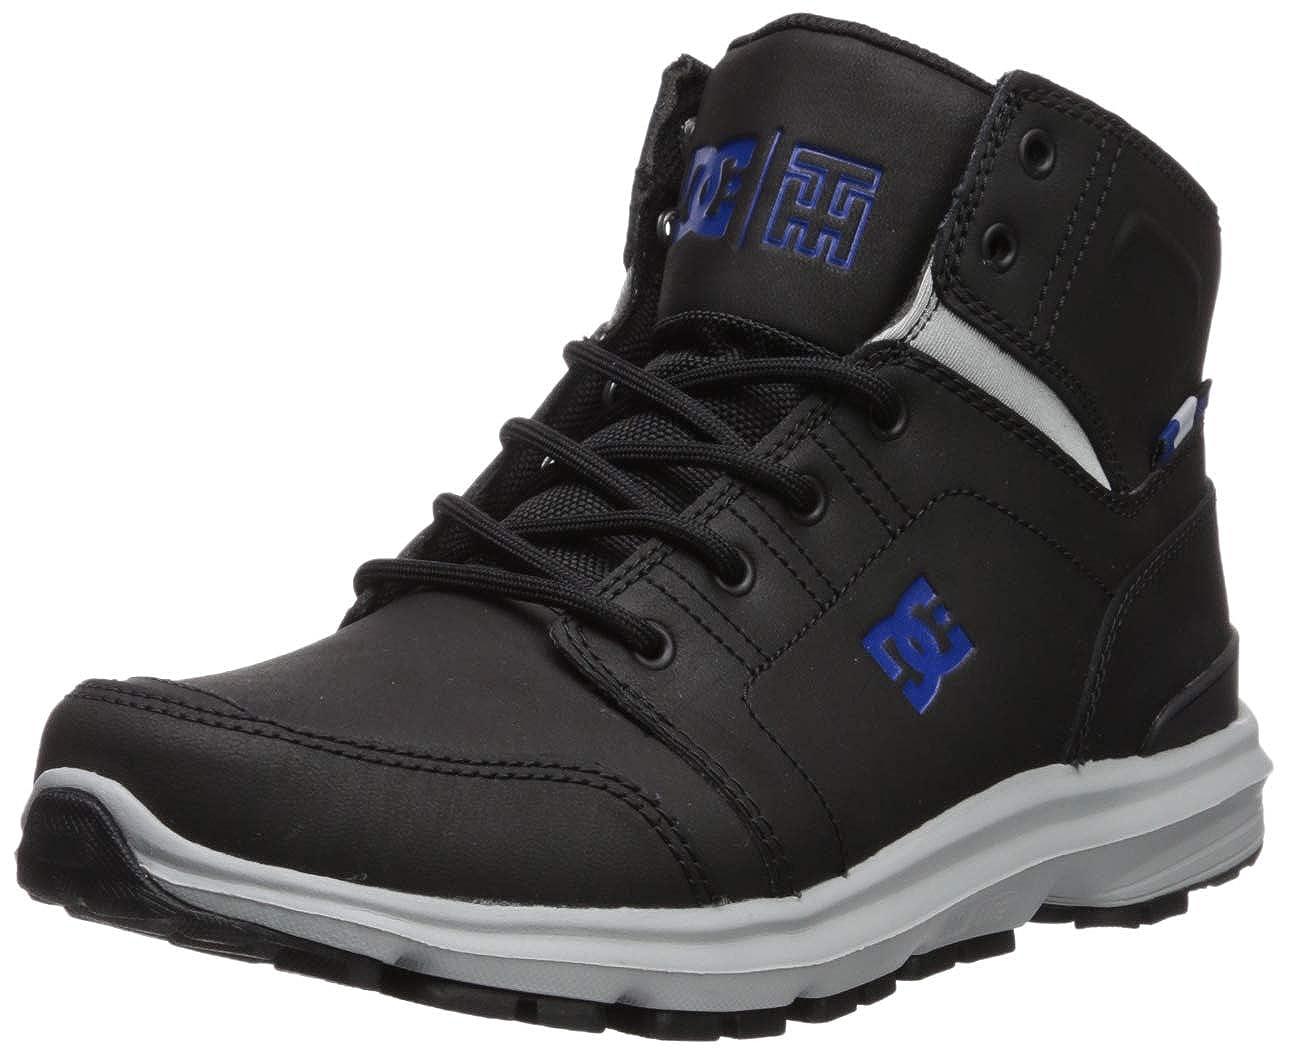 fde637451f5 Amazon.com: DC Shoes Mens Shoes Torstein Lace-Up Leather Boots Admb700008:  Shoes